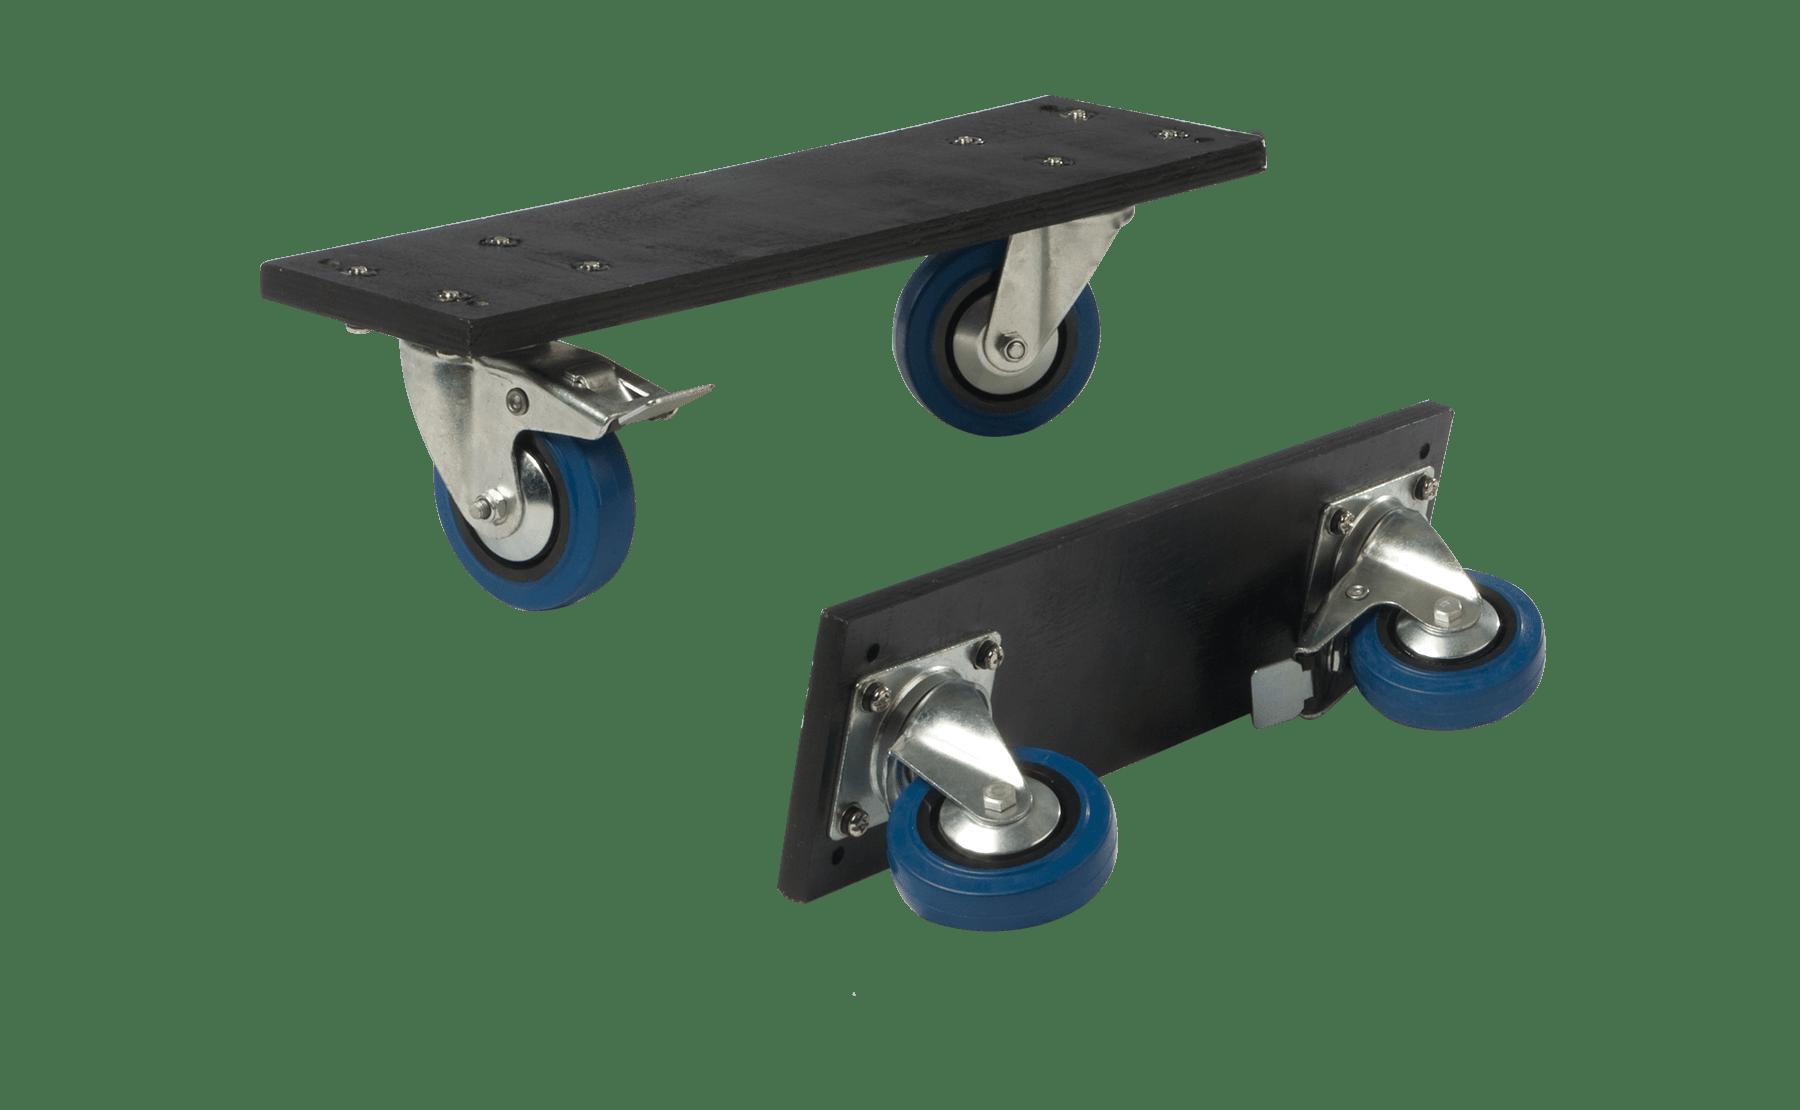 FCB50 - Large casterboard